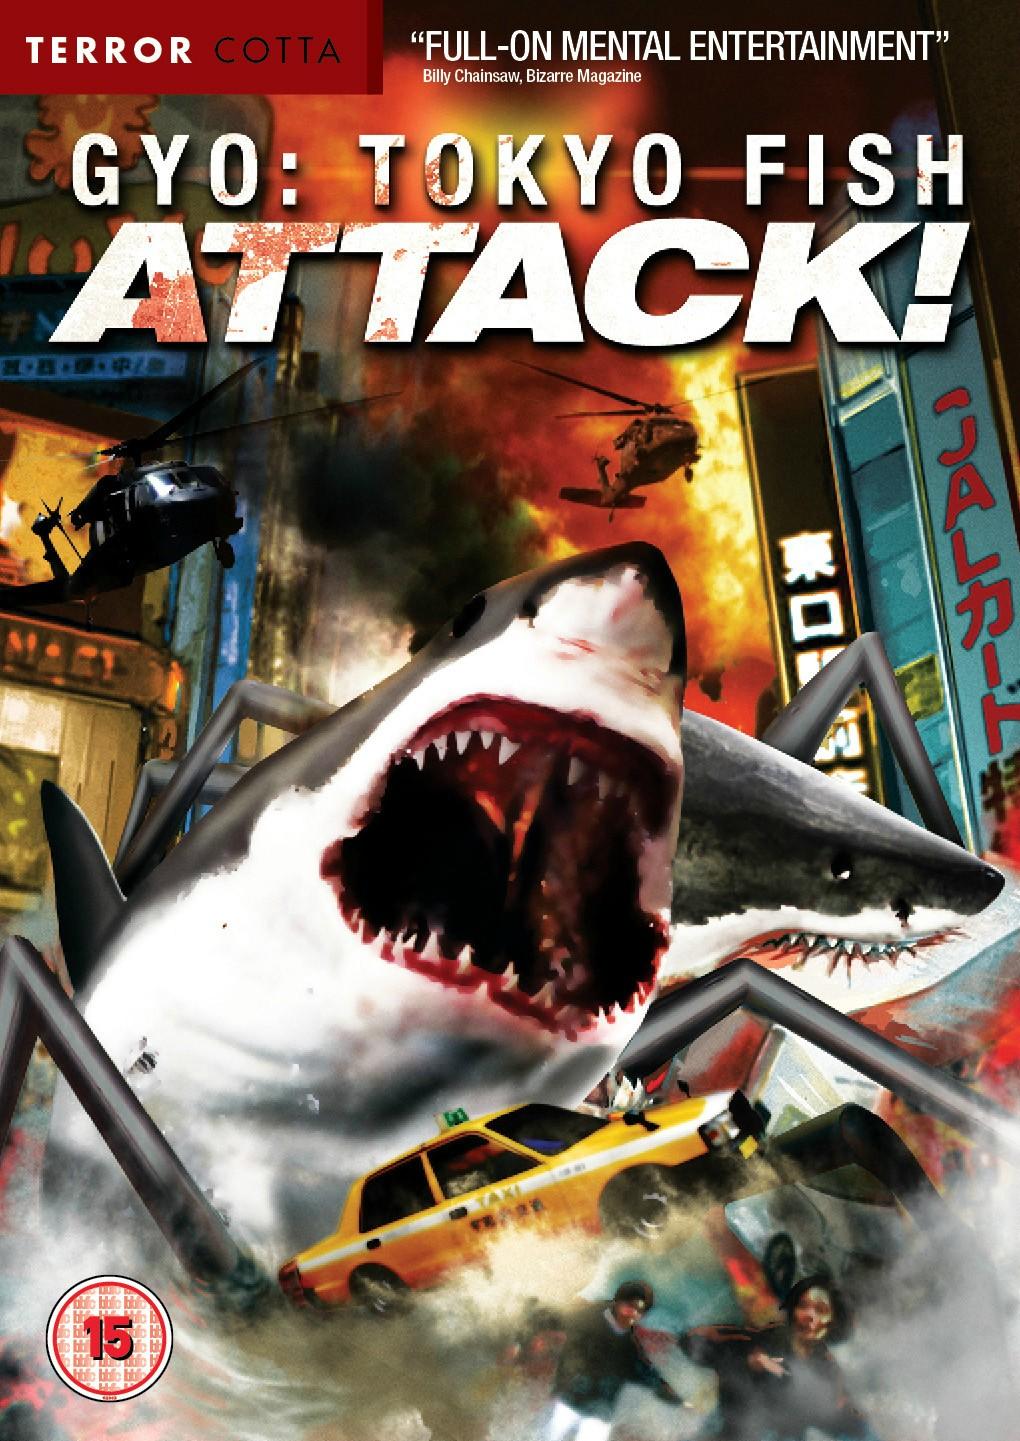 Gyo - Tokyo Fish Attack [DVDRIP] [VOSTFR] [MULTI]